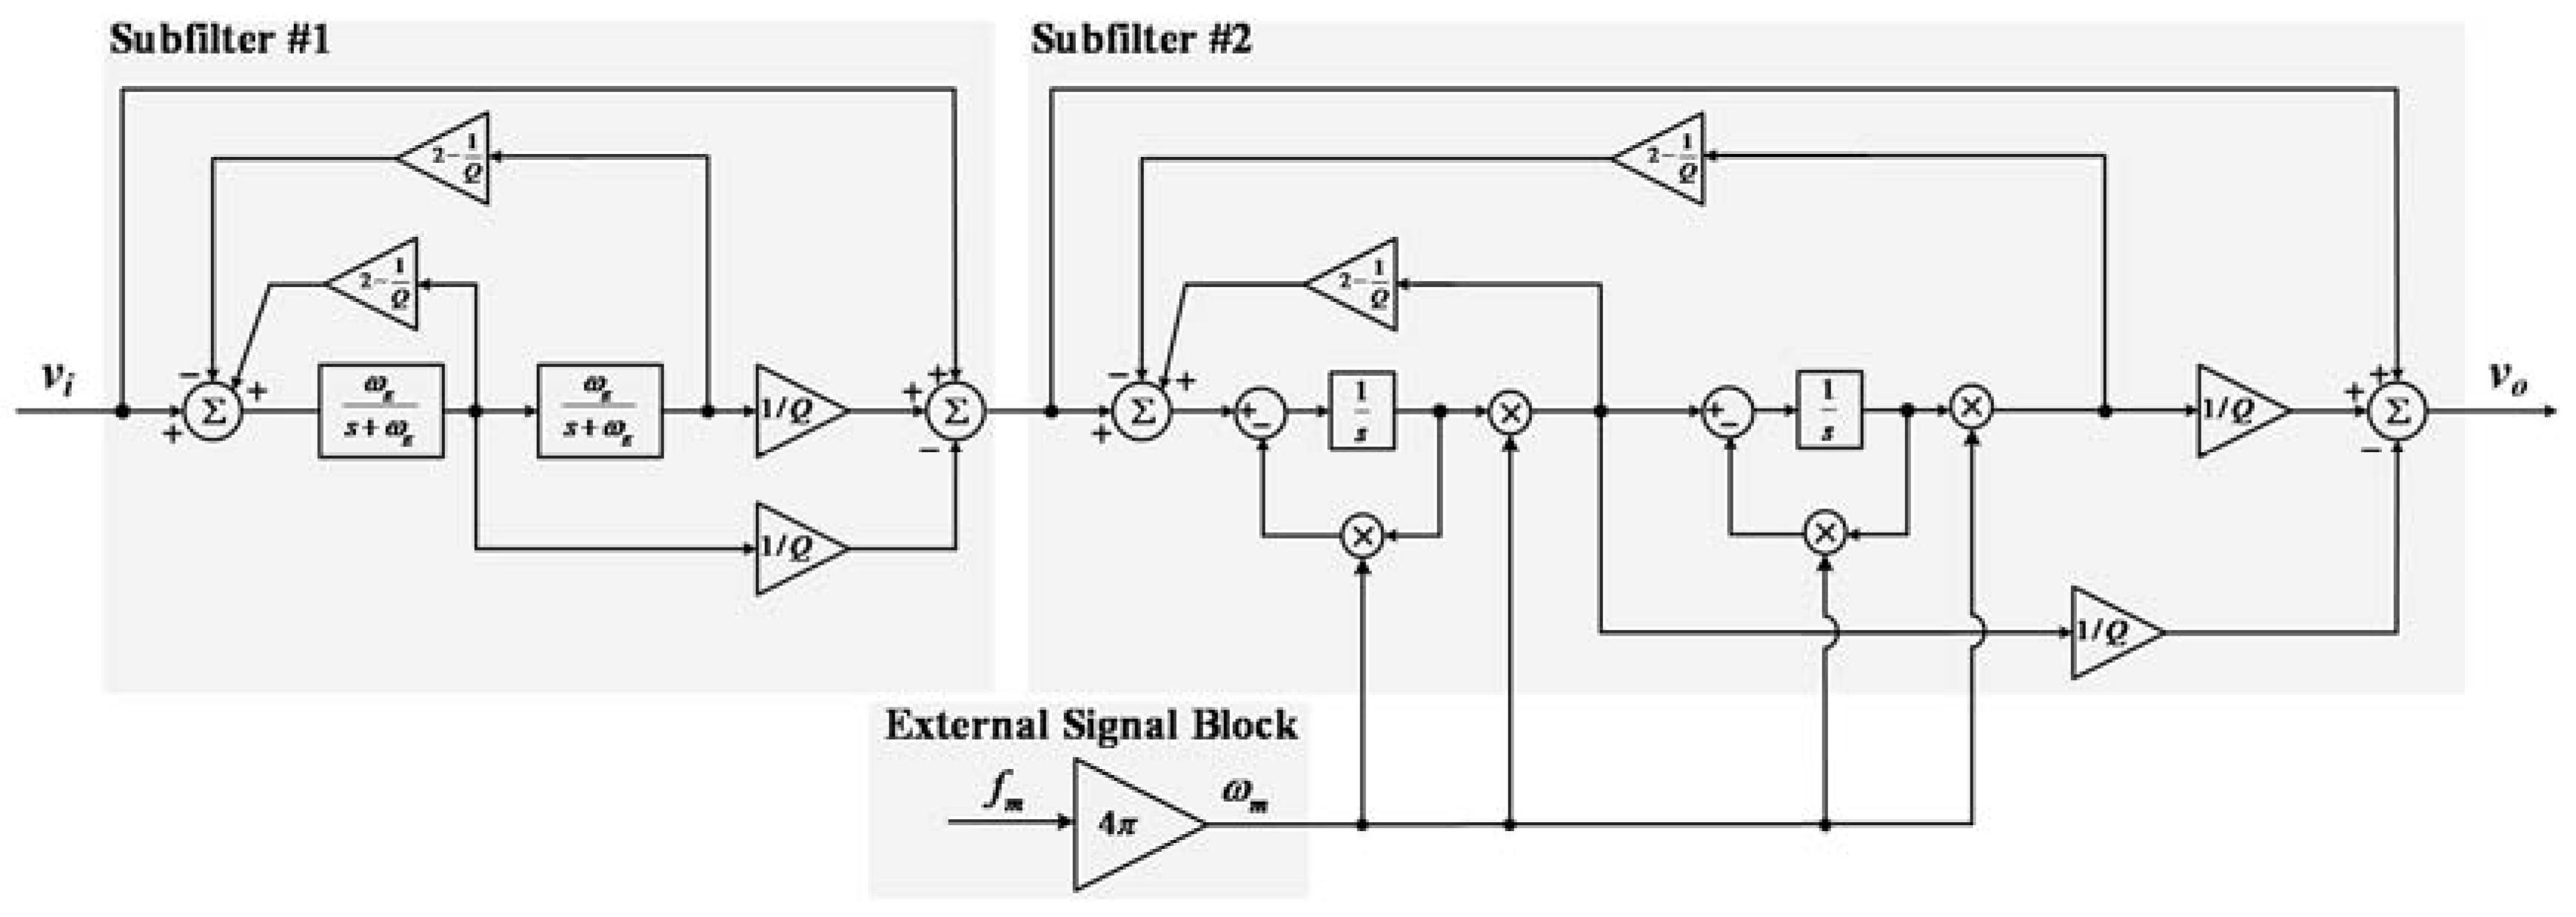 Energies Free Full Text An Enhanced Control Scheme Based On New H Bridge Block Diagram No